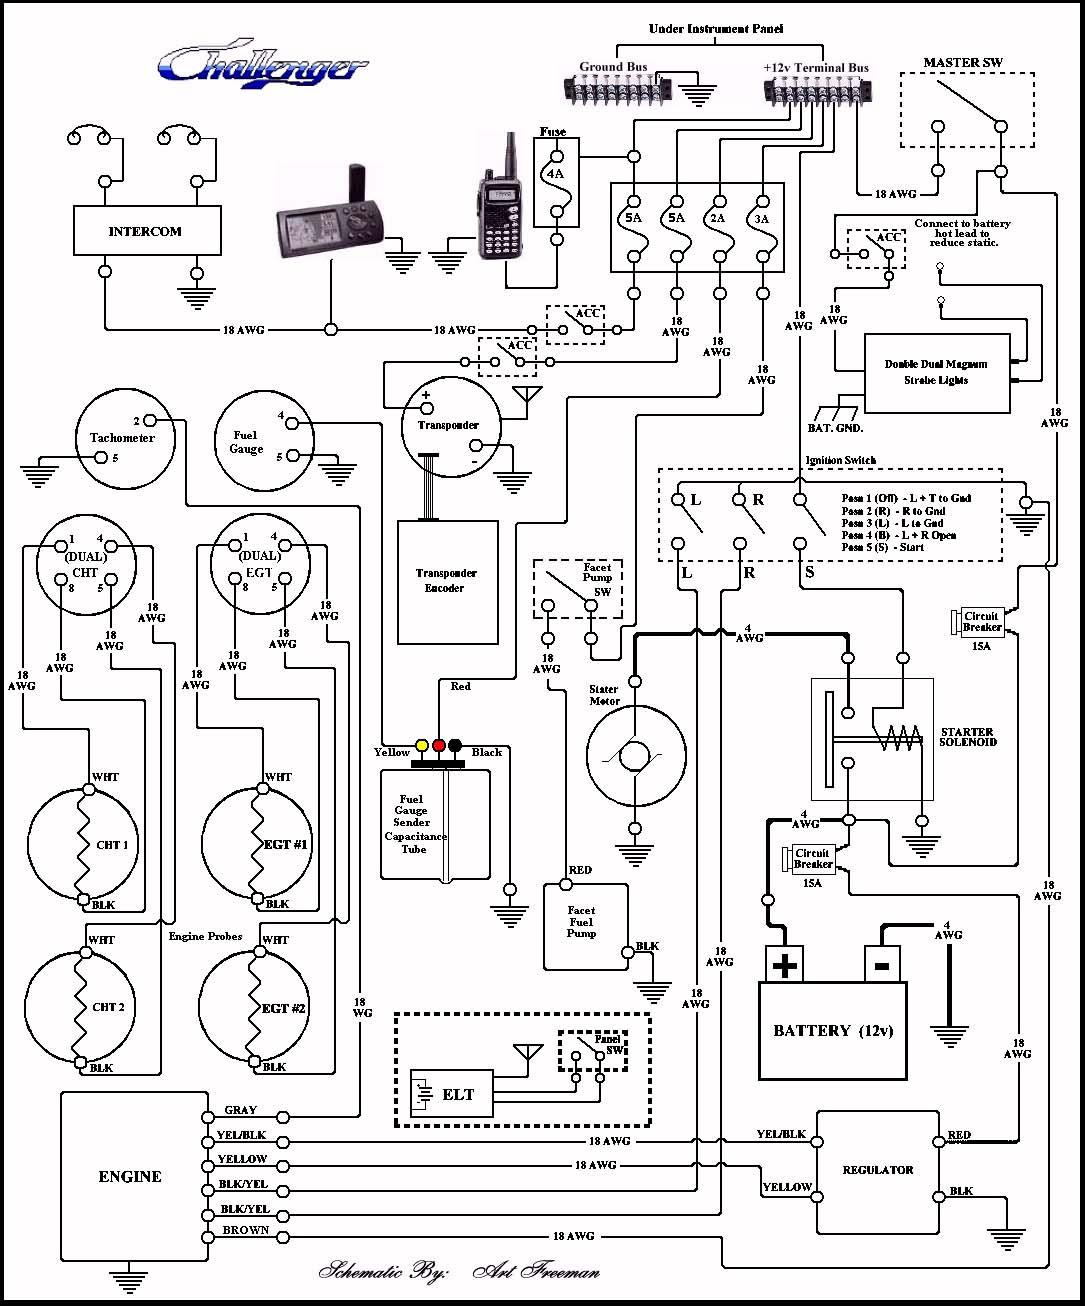 Airplane Wiring Schematic 2000 Mitsubishi Montero Sport Radio Wiring Diagram For Wiring Diagram Schematics